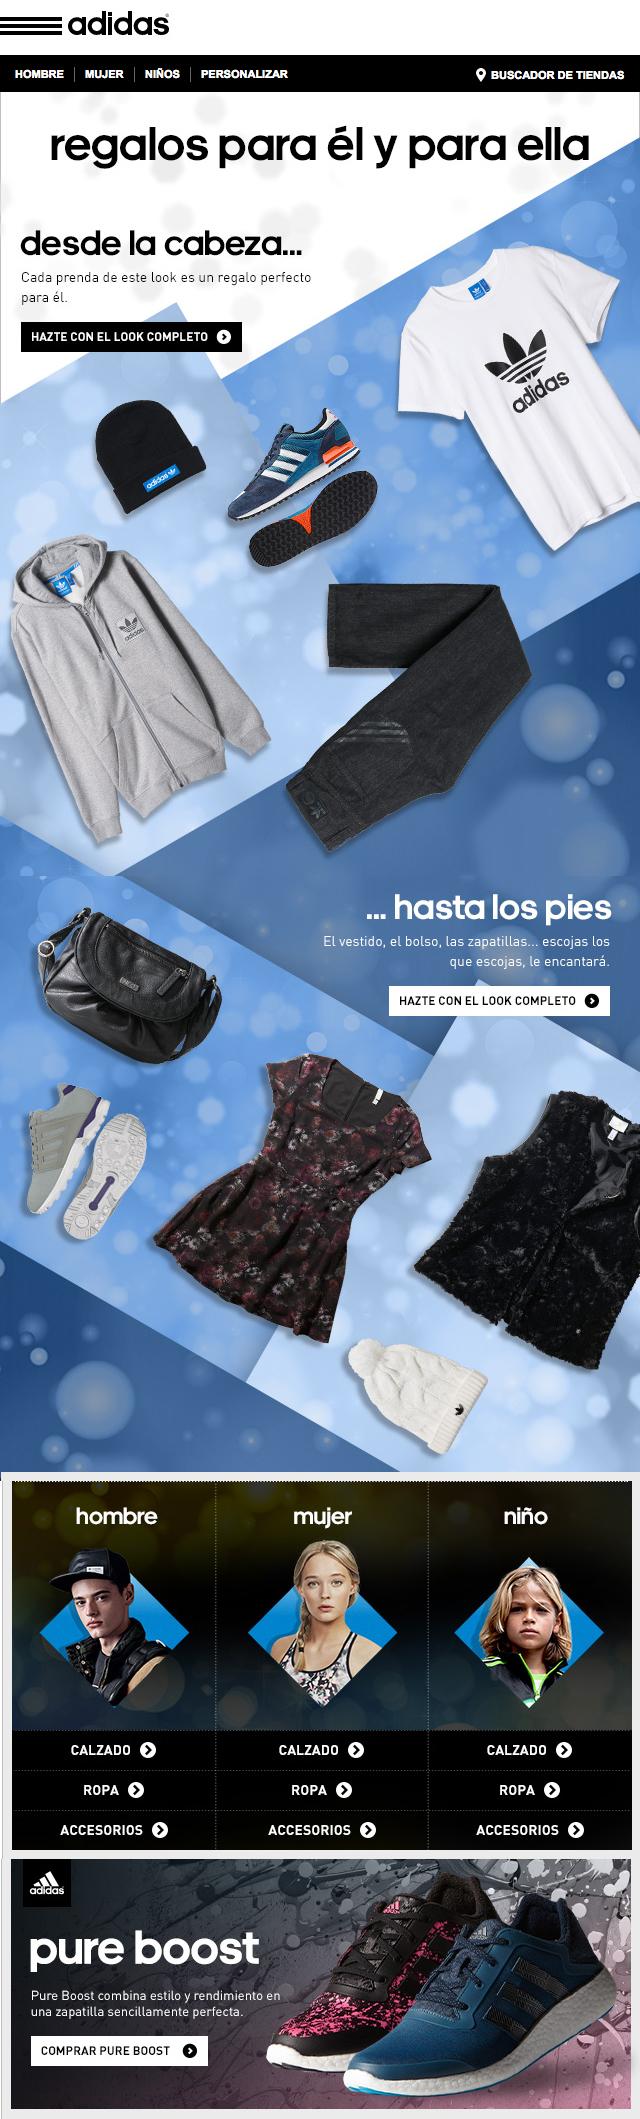 fatiga Apto borgoña  Adidas Newsletter FW14   Email layout, Newsletter design, Email design